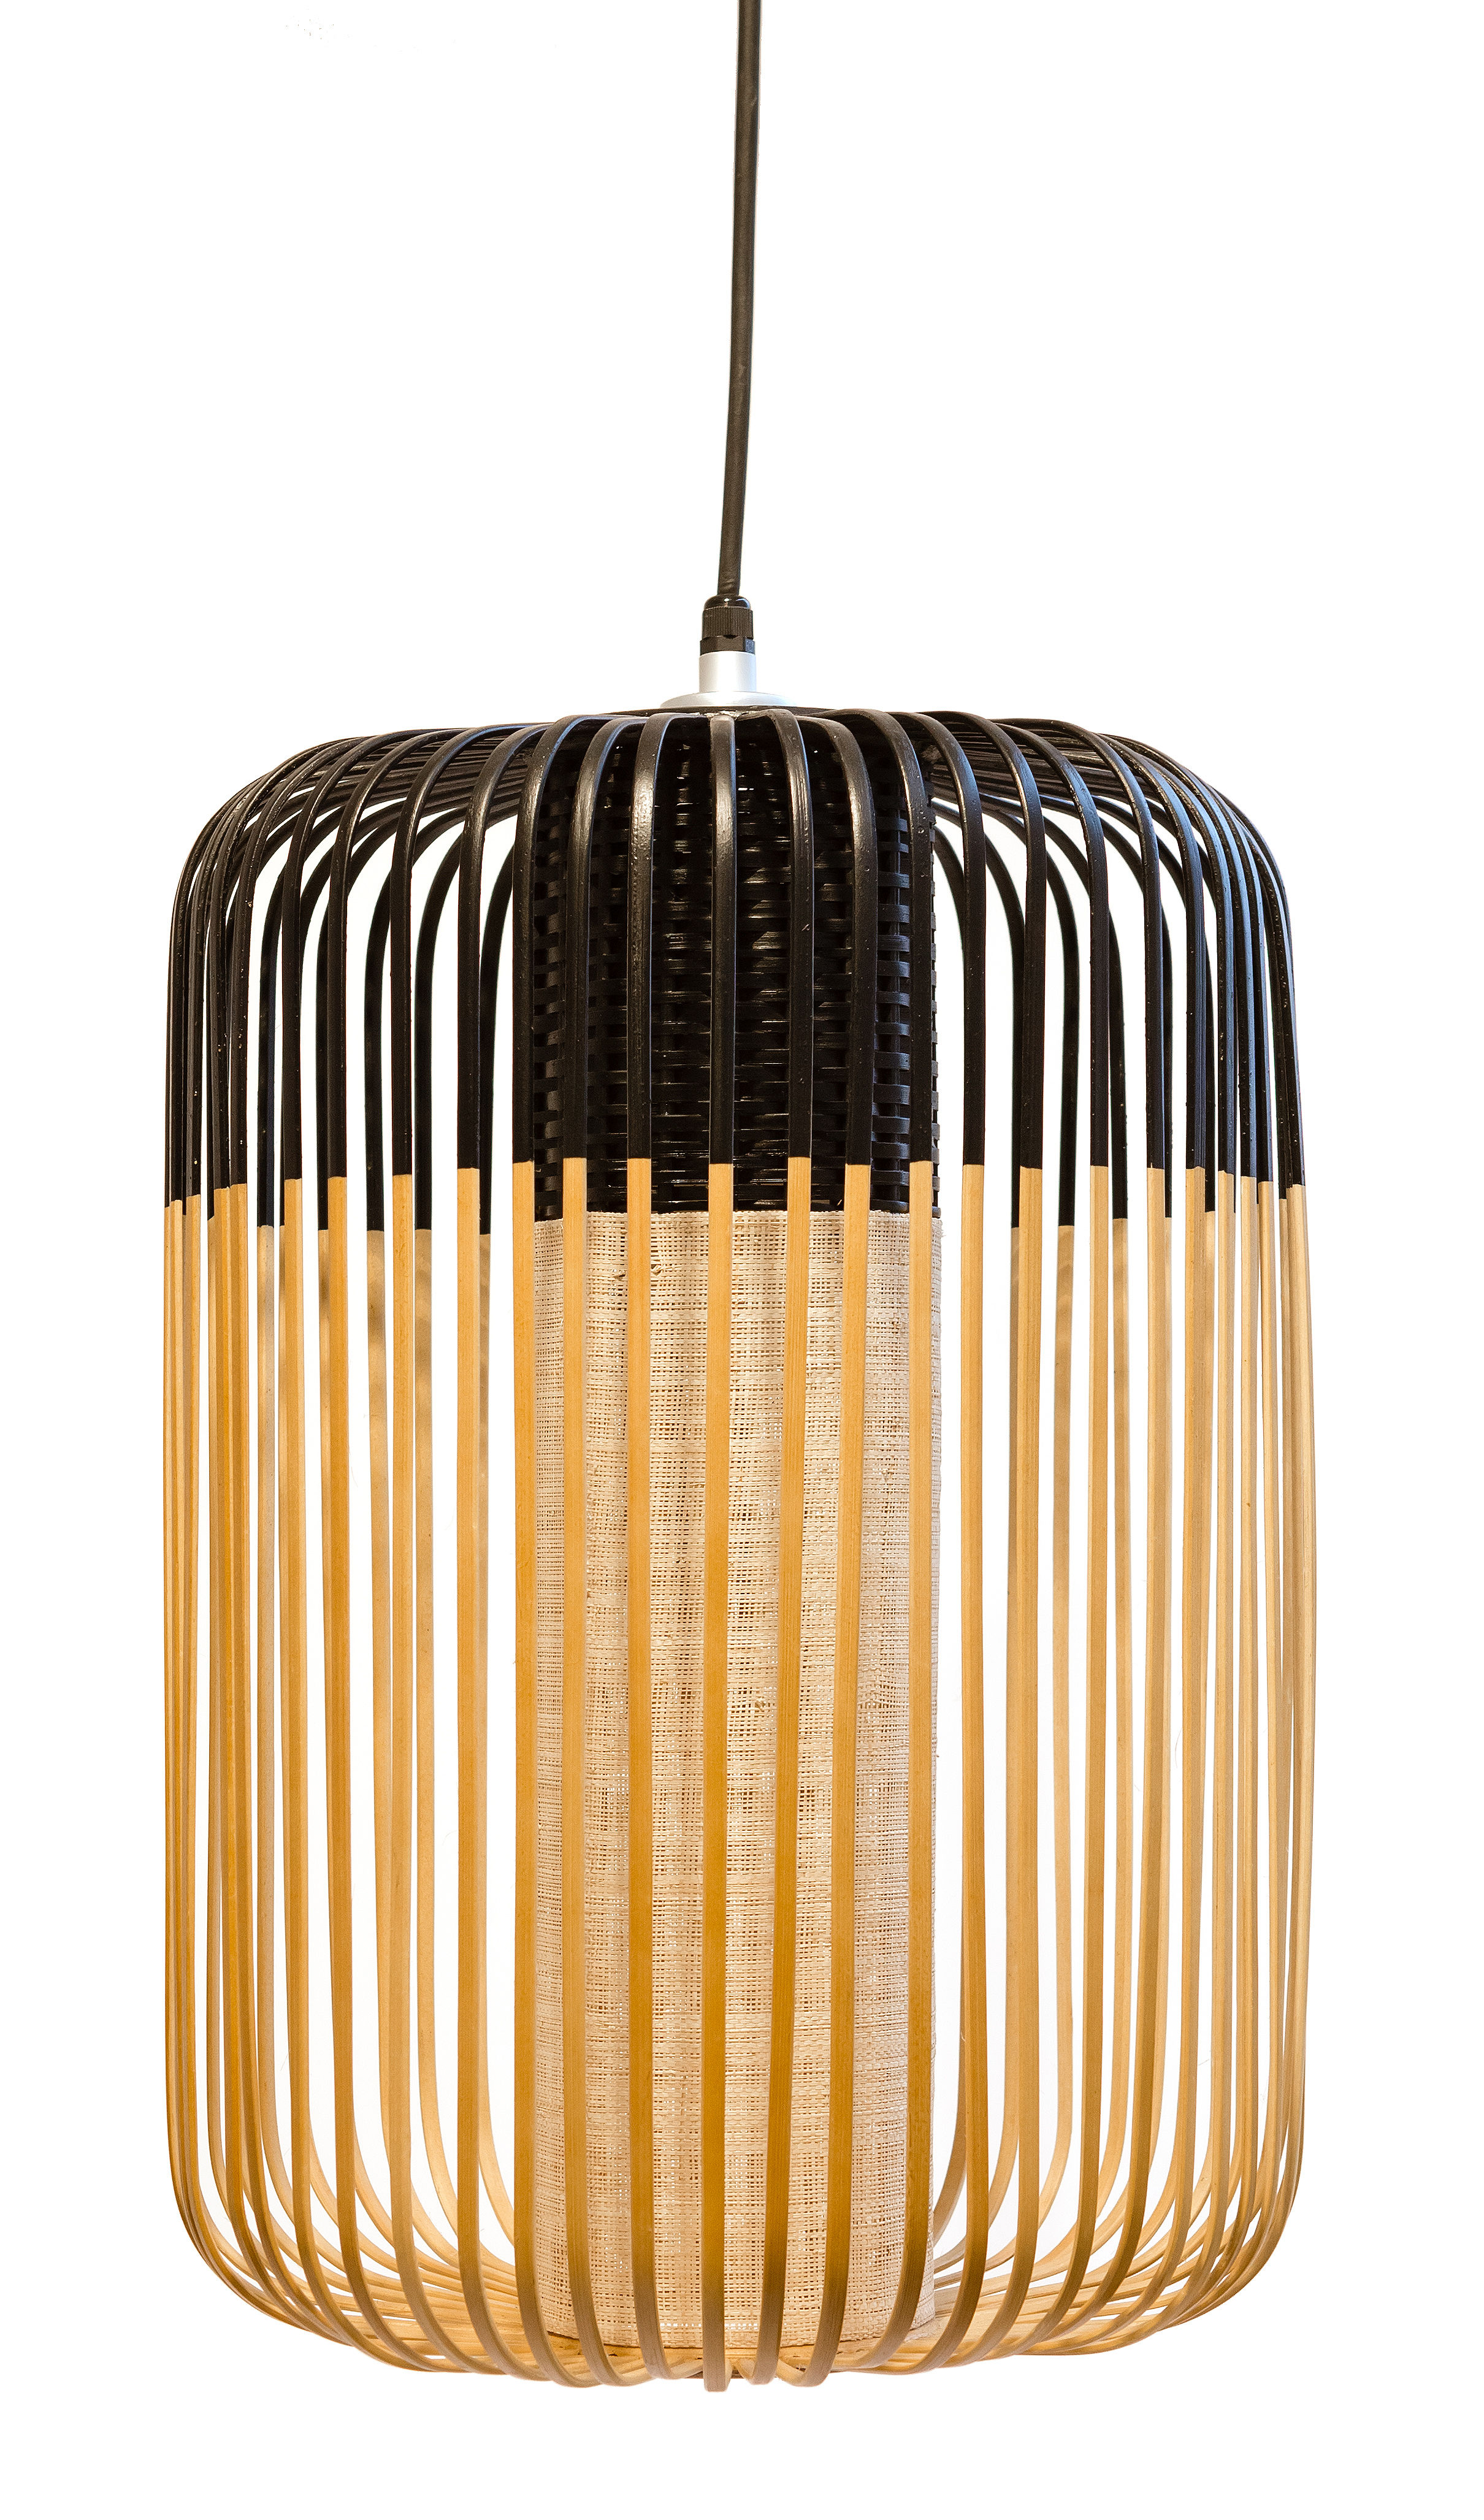 Leuchten - Pendelleuchten - Bamboo Light L Pendelleuchte / H 50 cm x Ø 35 cm - Forestier - Schwarz / natur - Gewebe, Metall, Naturbambus